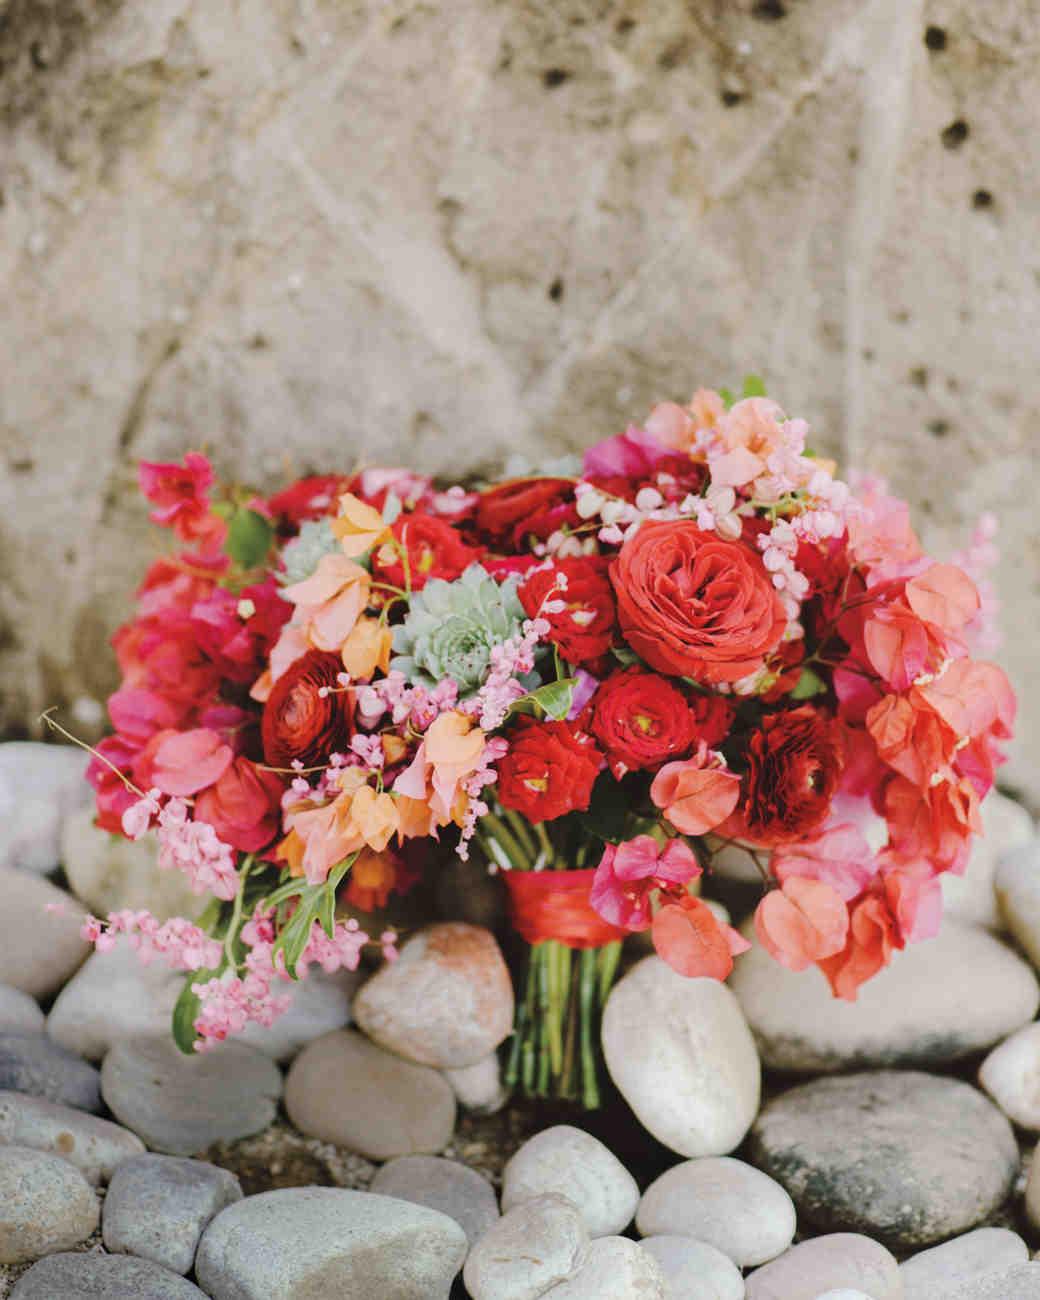 Fall Wedding Flower Bouquets Ideas Unique Wedding Ideas All About